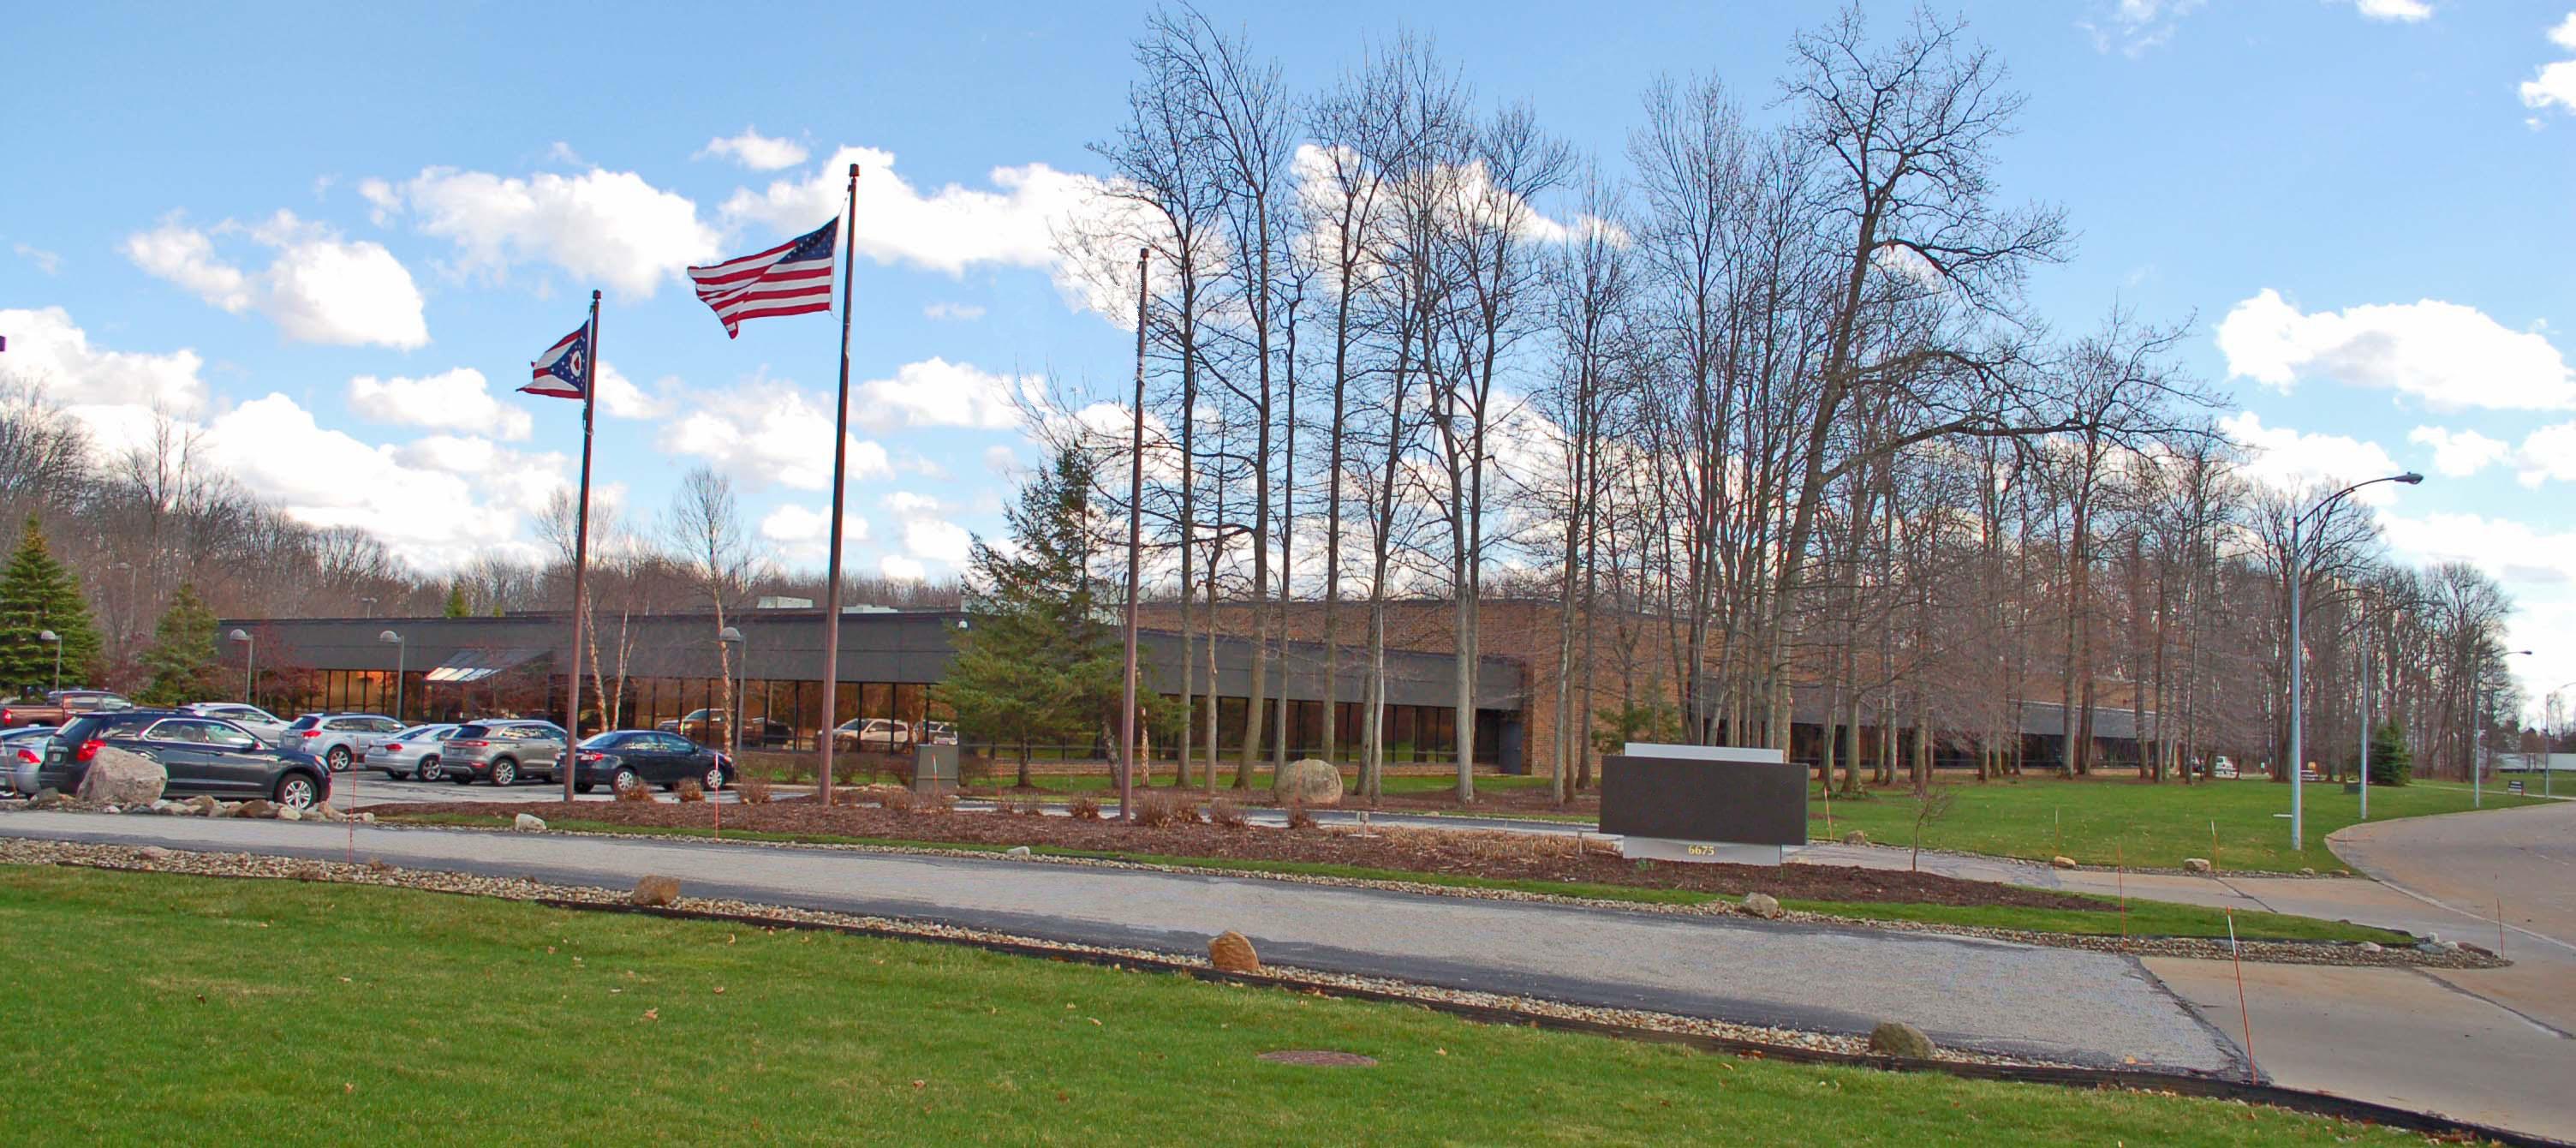 Image of property at 6675 Parkland Blvd, Solon, Ohio 44139